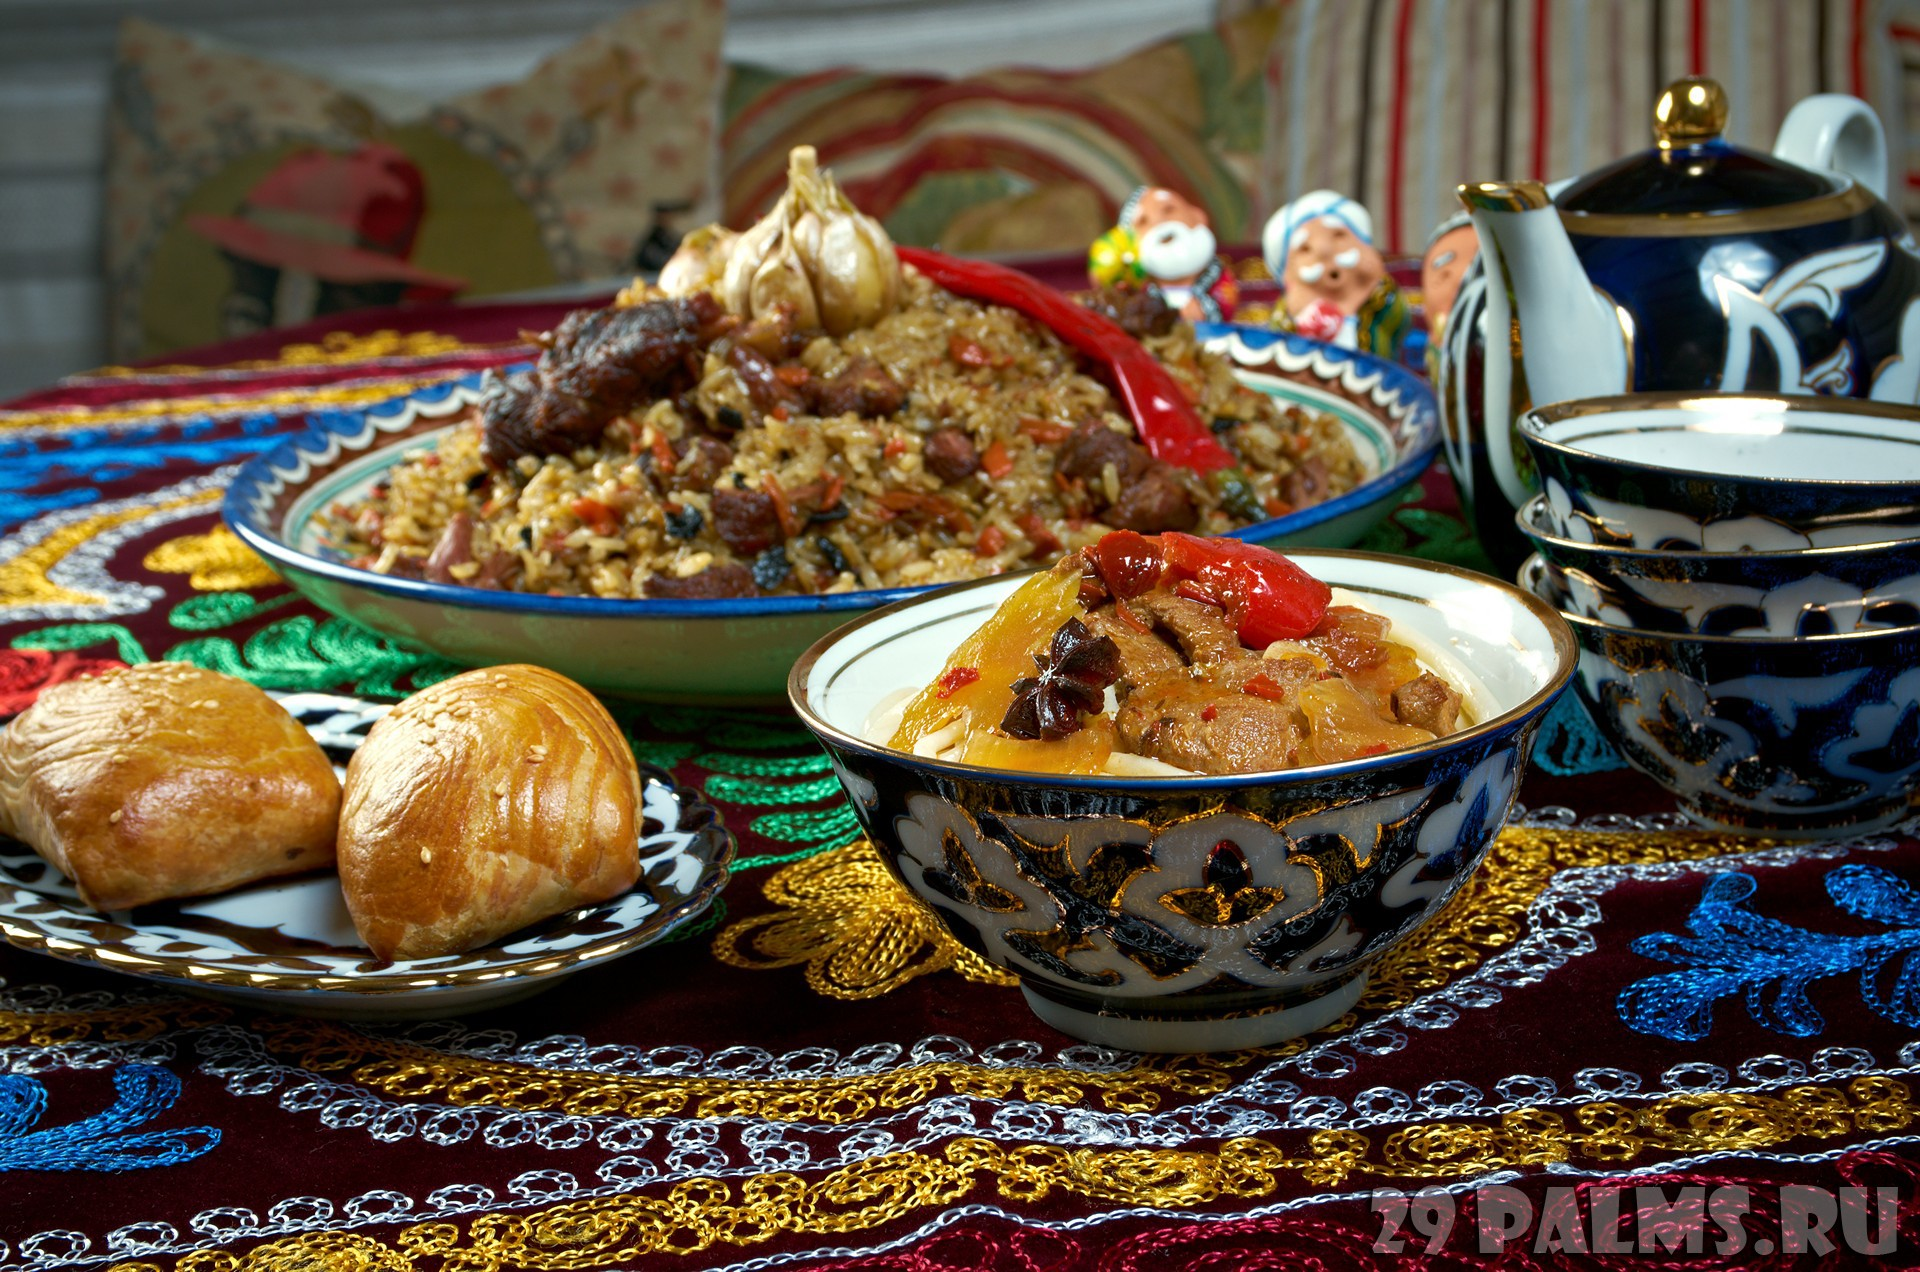 food set  Central Asian cuisine - plov, lagman,sherbet  and samsa